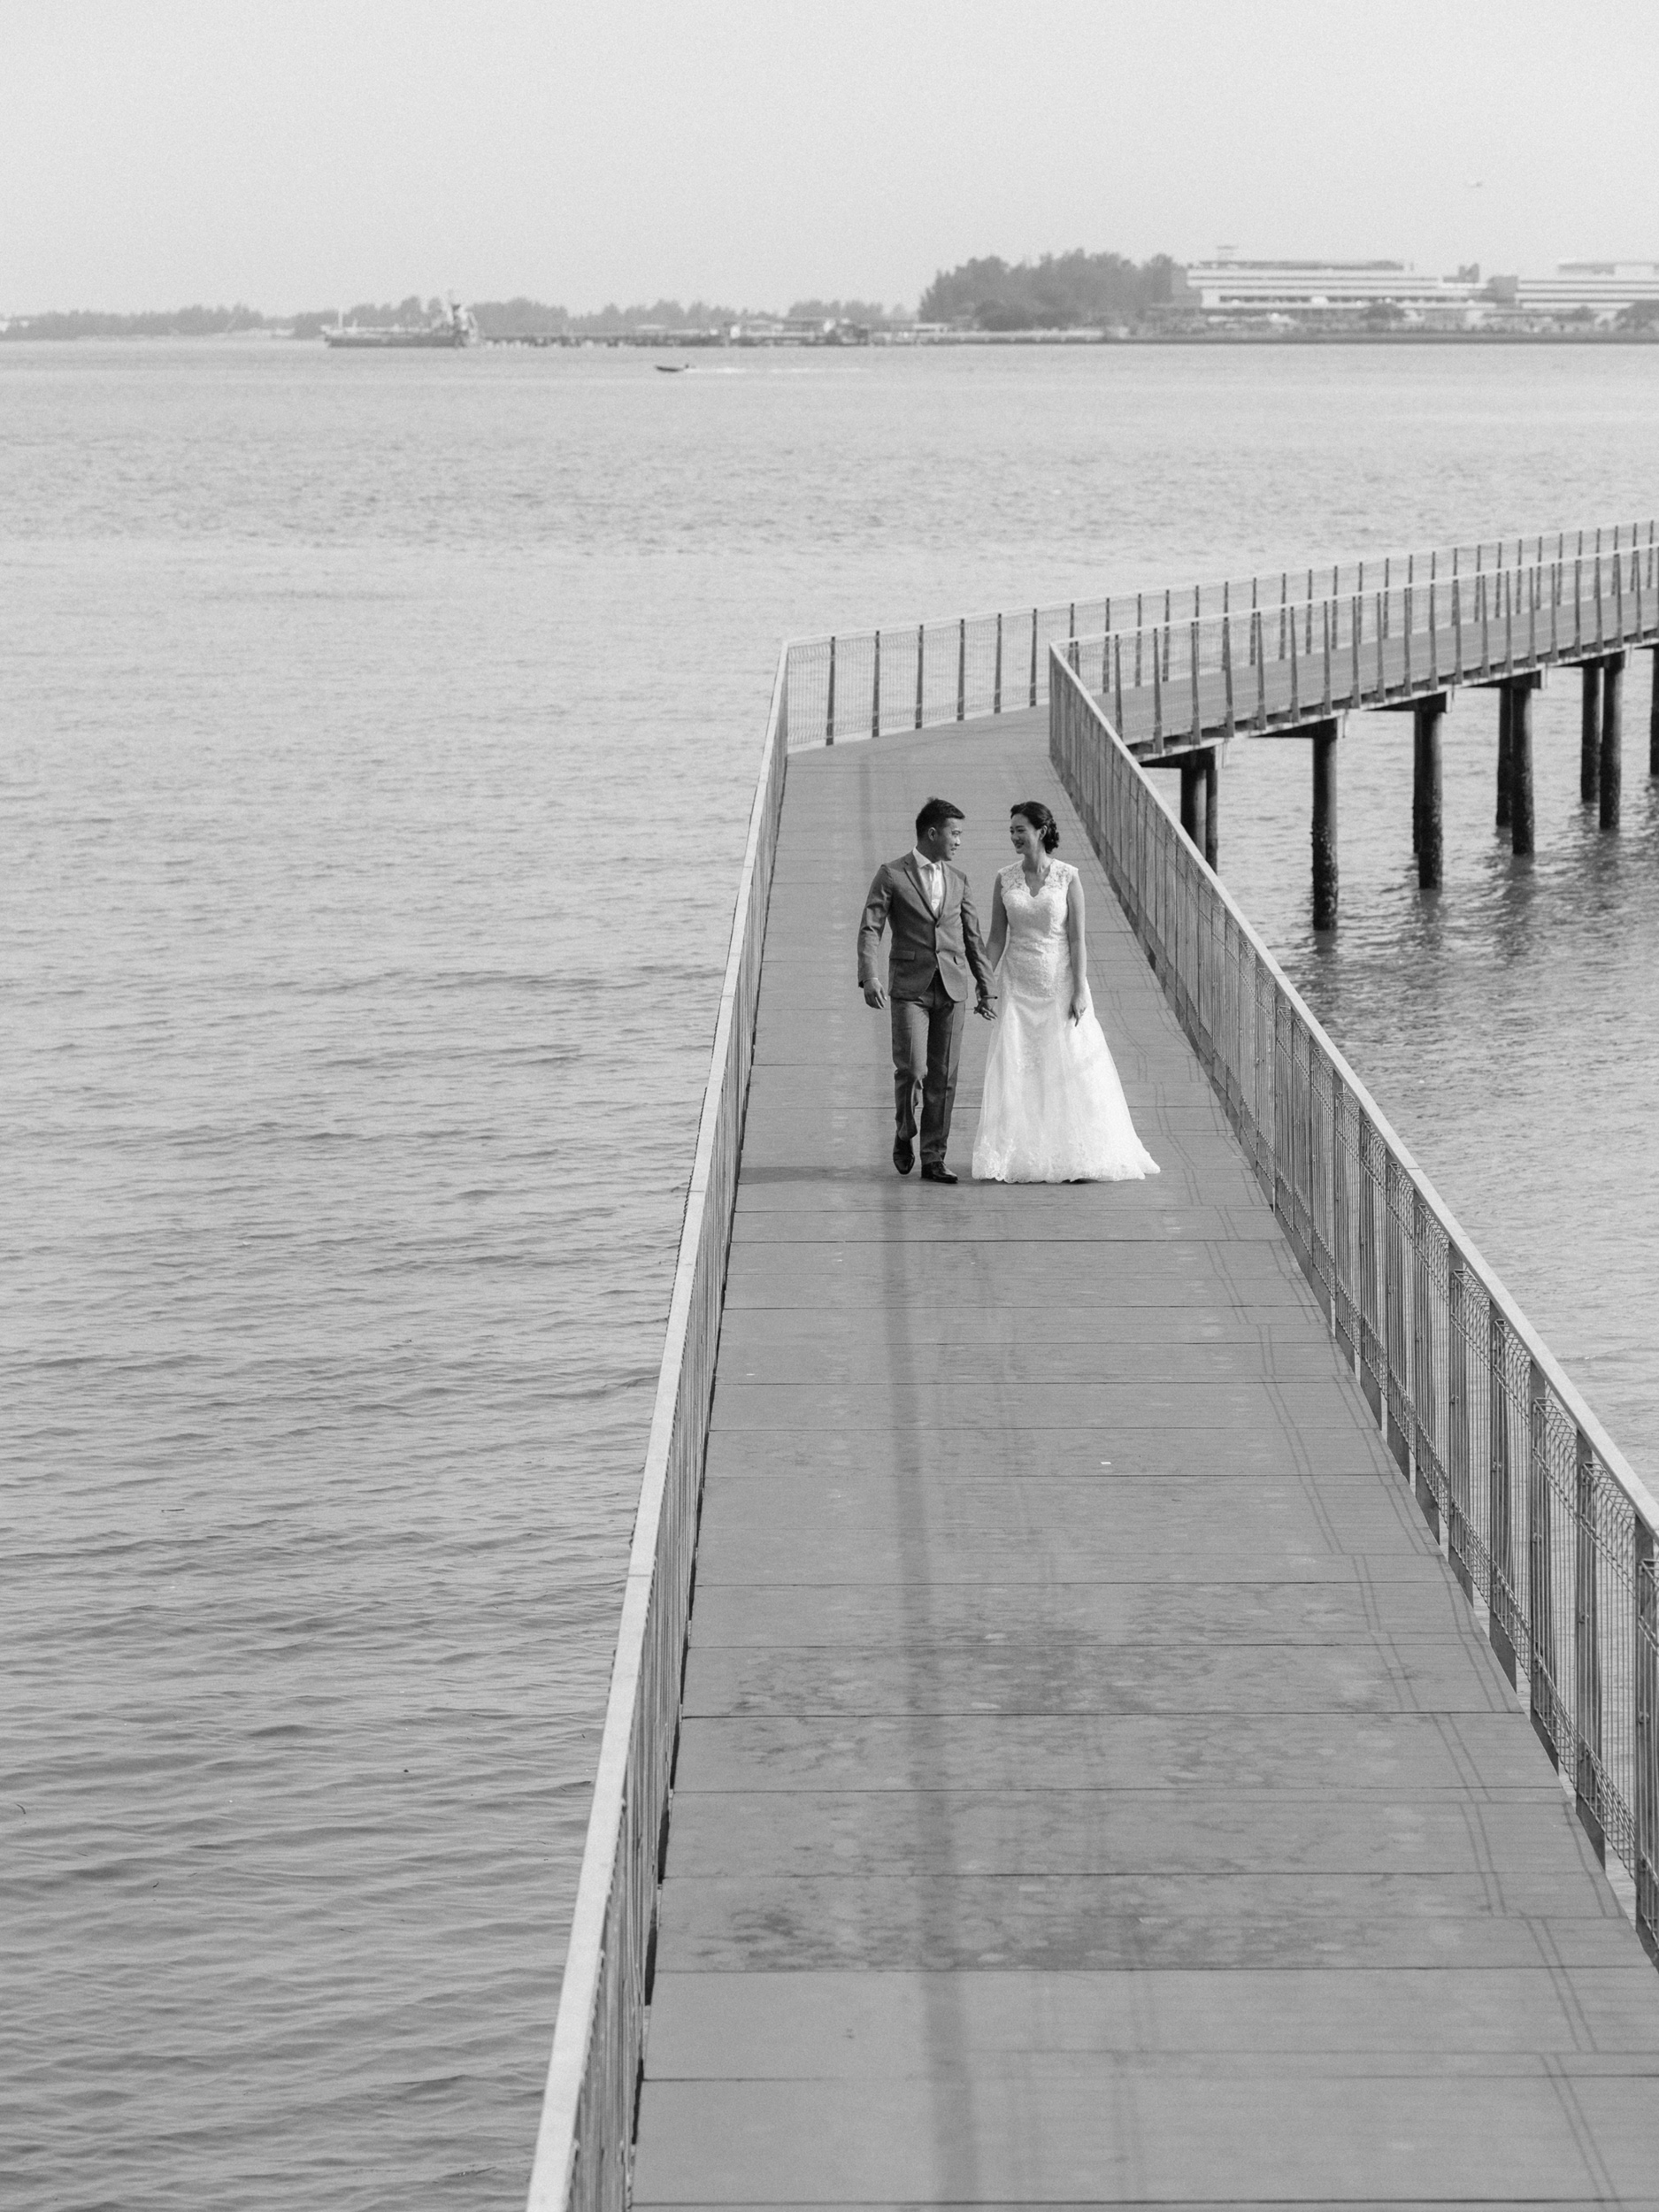 singapore-wedding-photographer-wemadethese-junekit-kingslin-08.jpg